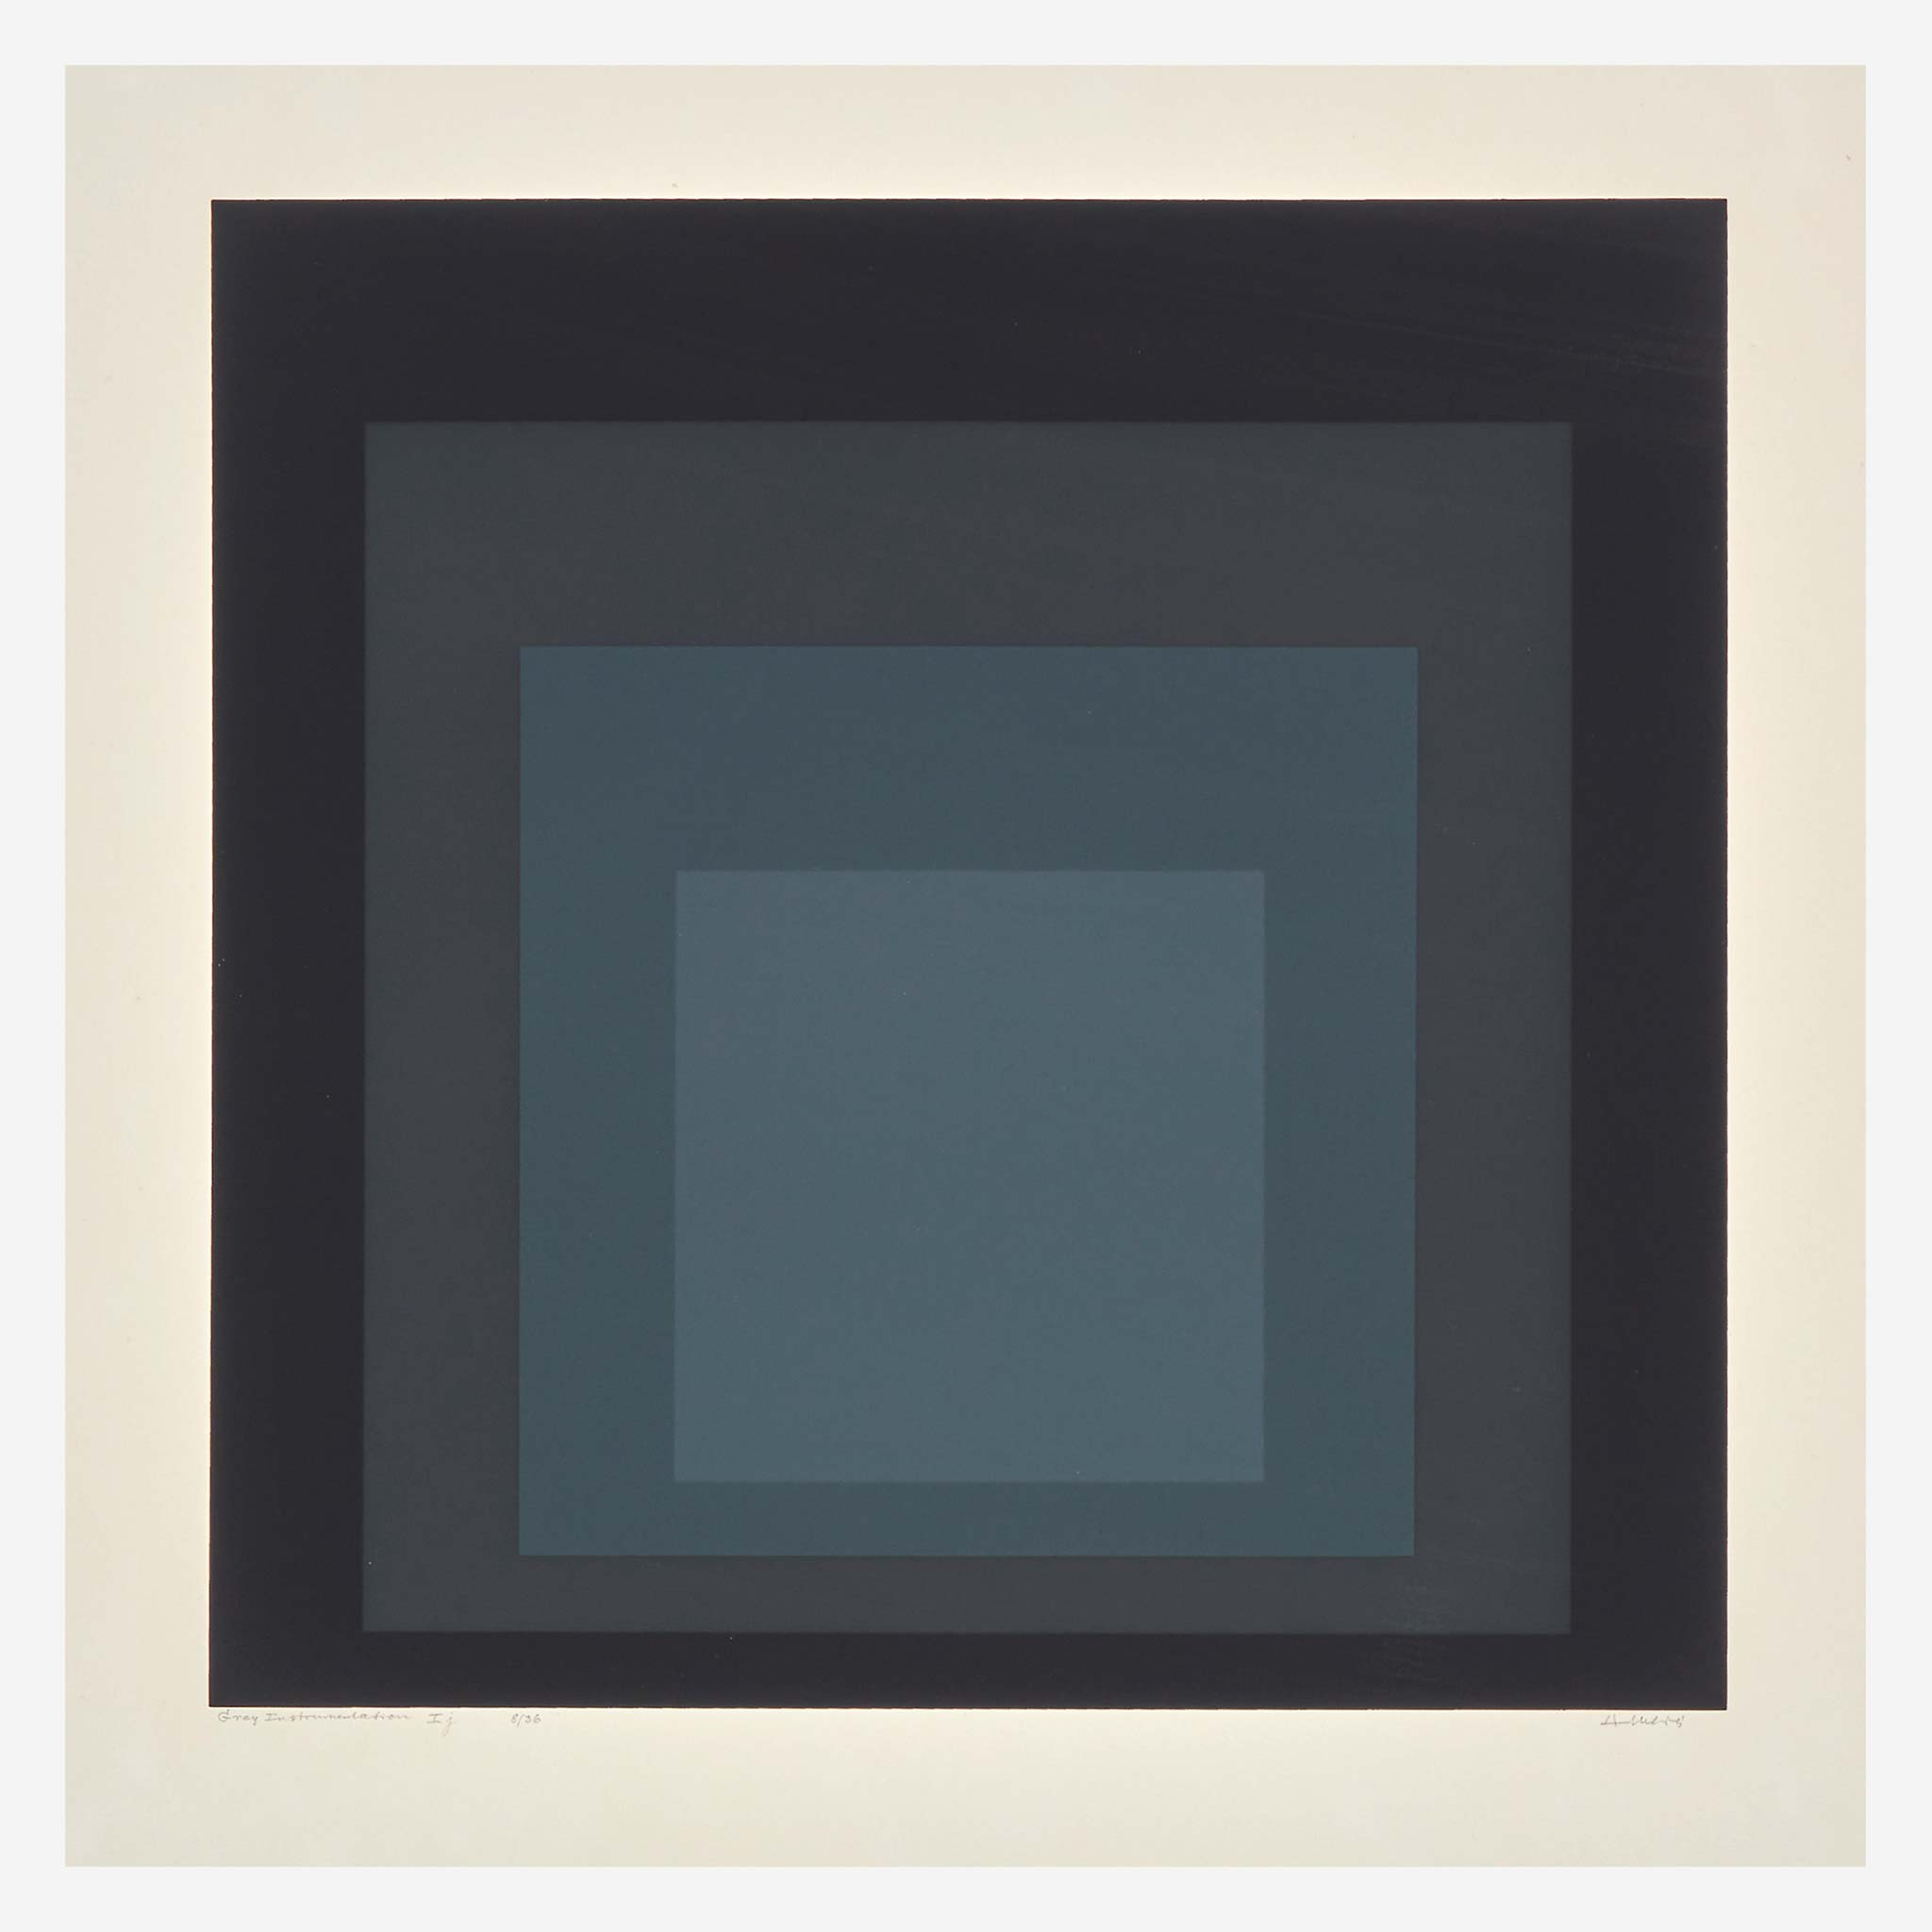 Josef Albers (American/German, 1888-1976), 'Gray Instrumentation,' 1974, $8,500 plus buyer's premium. Image courtesy Freeman's